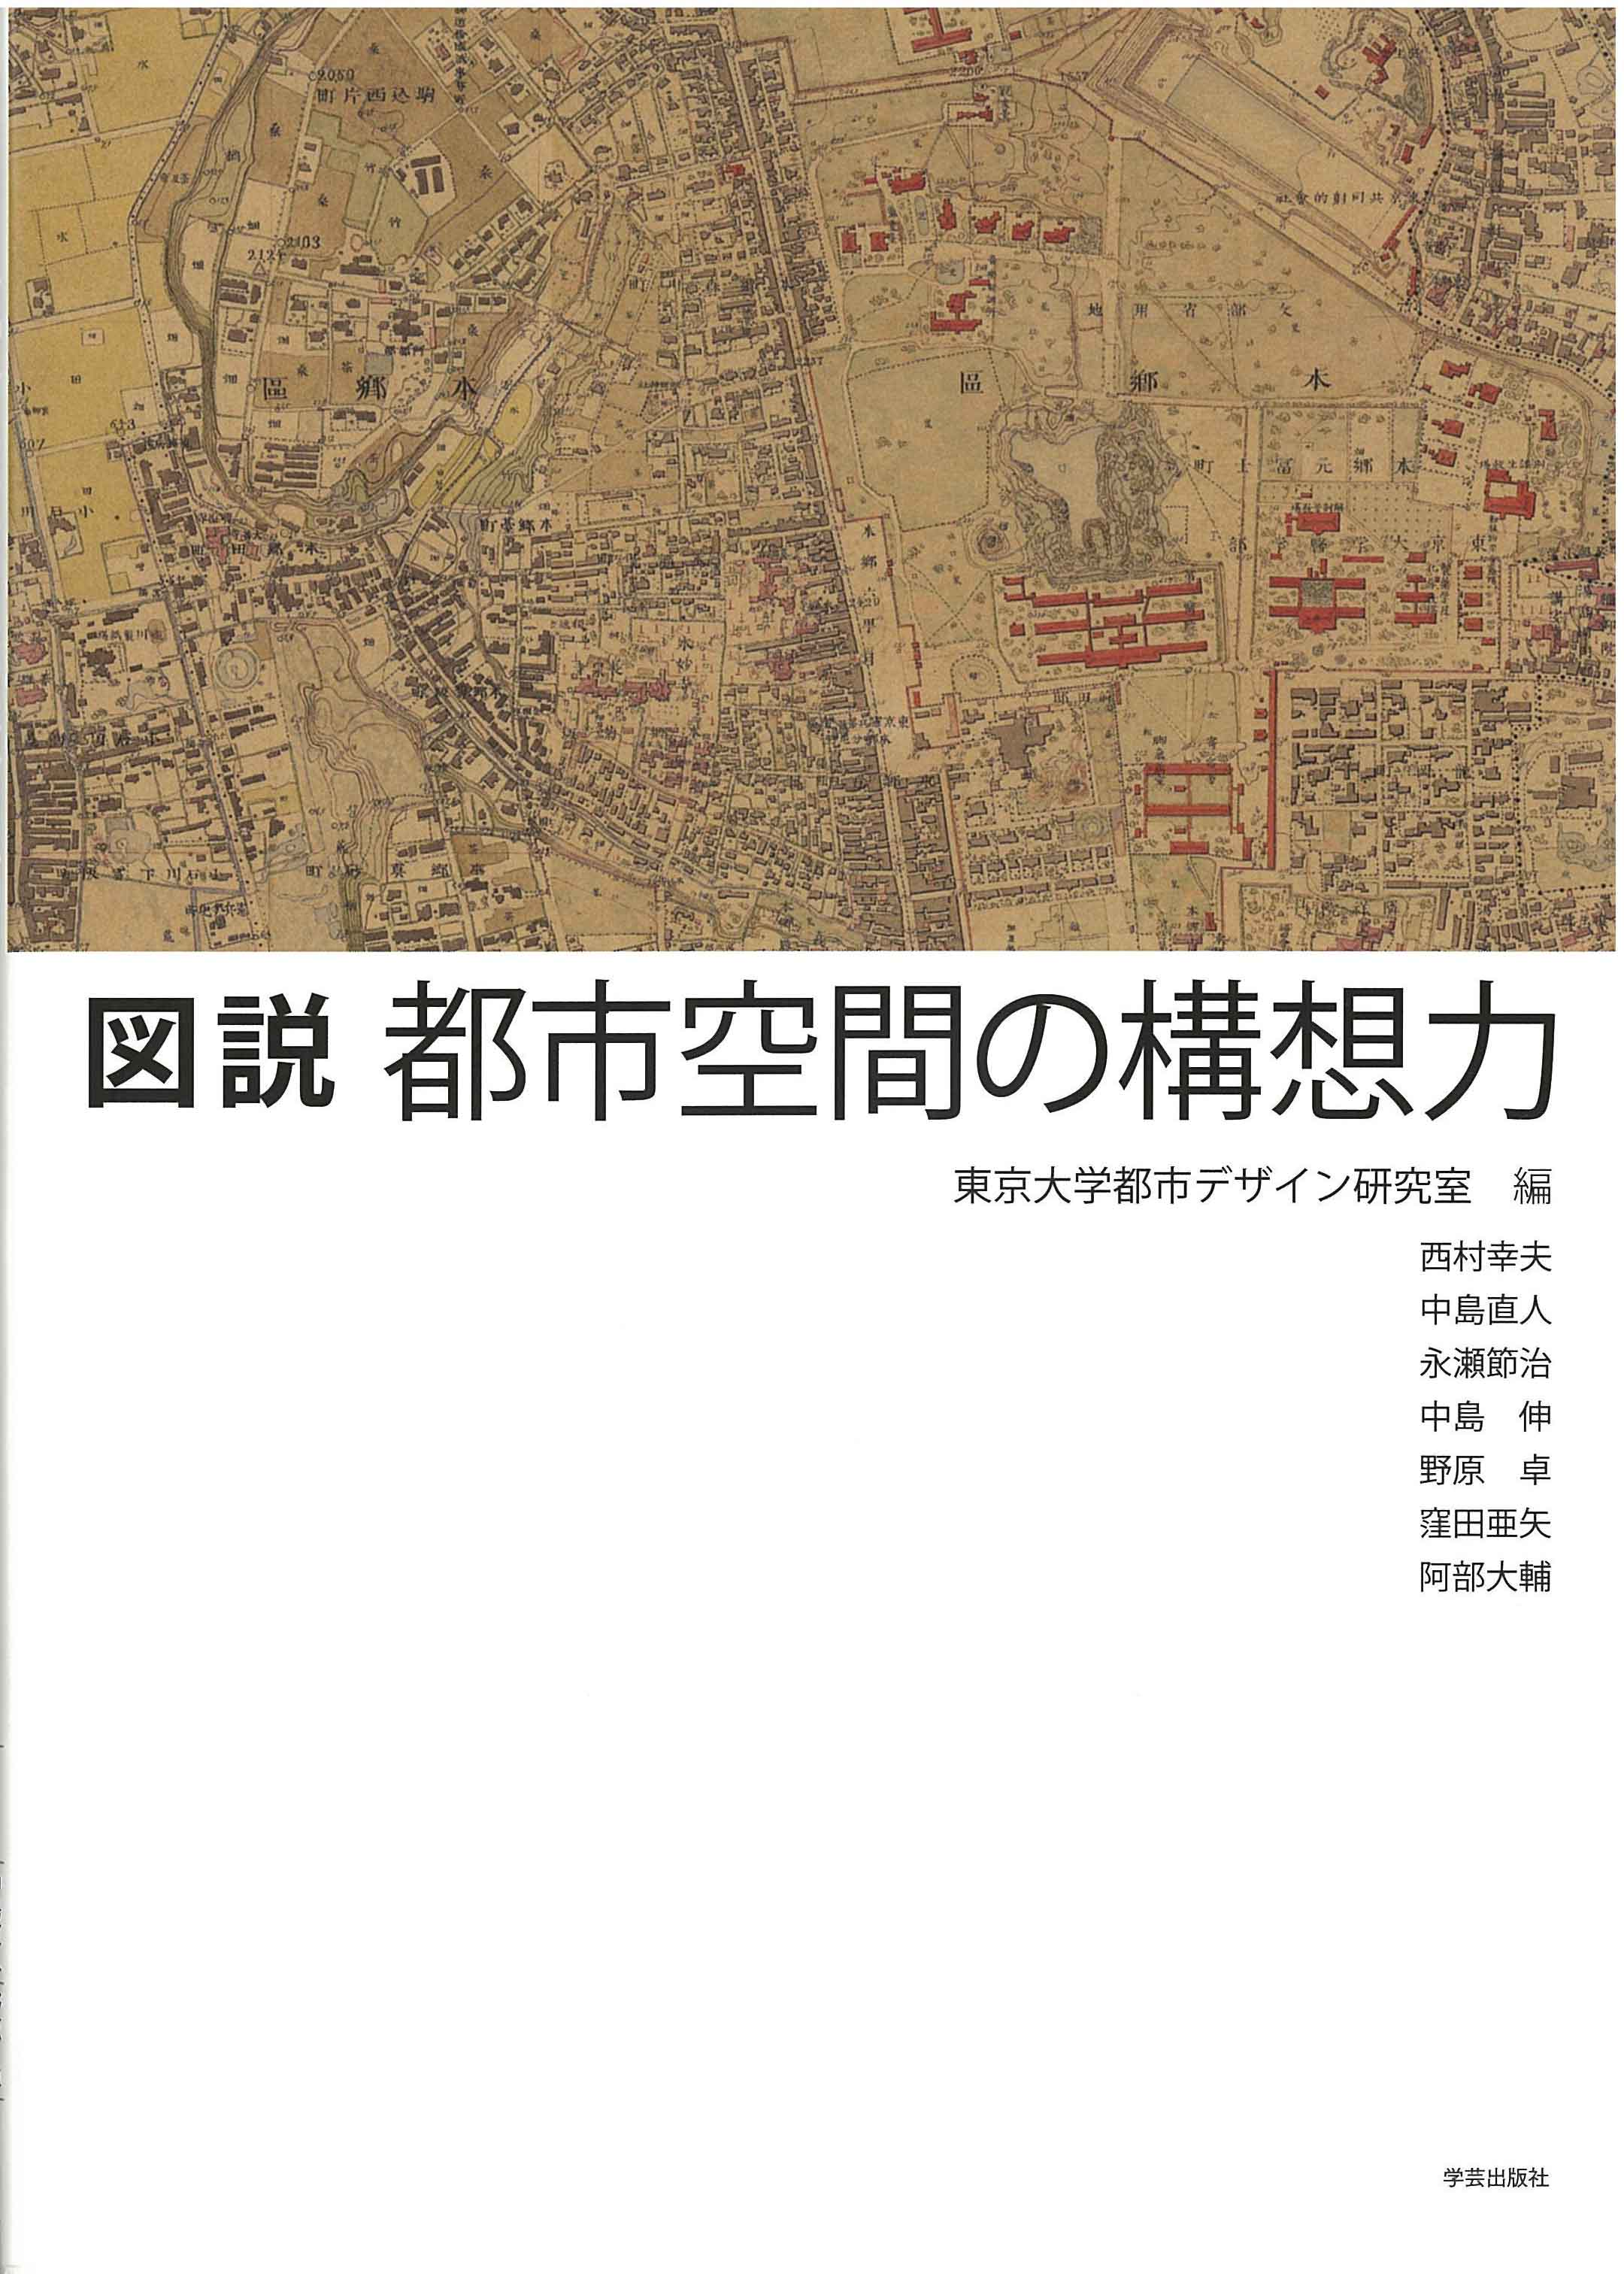 http://ud.t.u-tokyo.ac.jp/blog/_images/%E9%83%BD%E5%B8%82%E7%A9%BA%E9%96%93%E3%81%AE%E6%A7%8B%E6%83%B3%E5%8A%9B.jpg